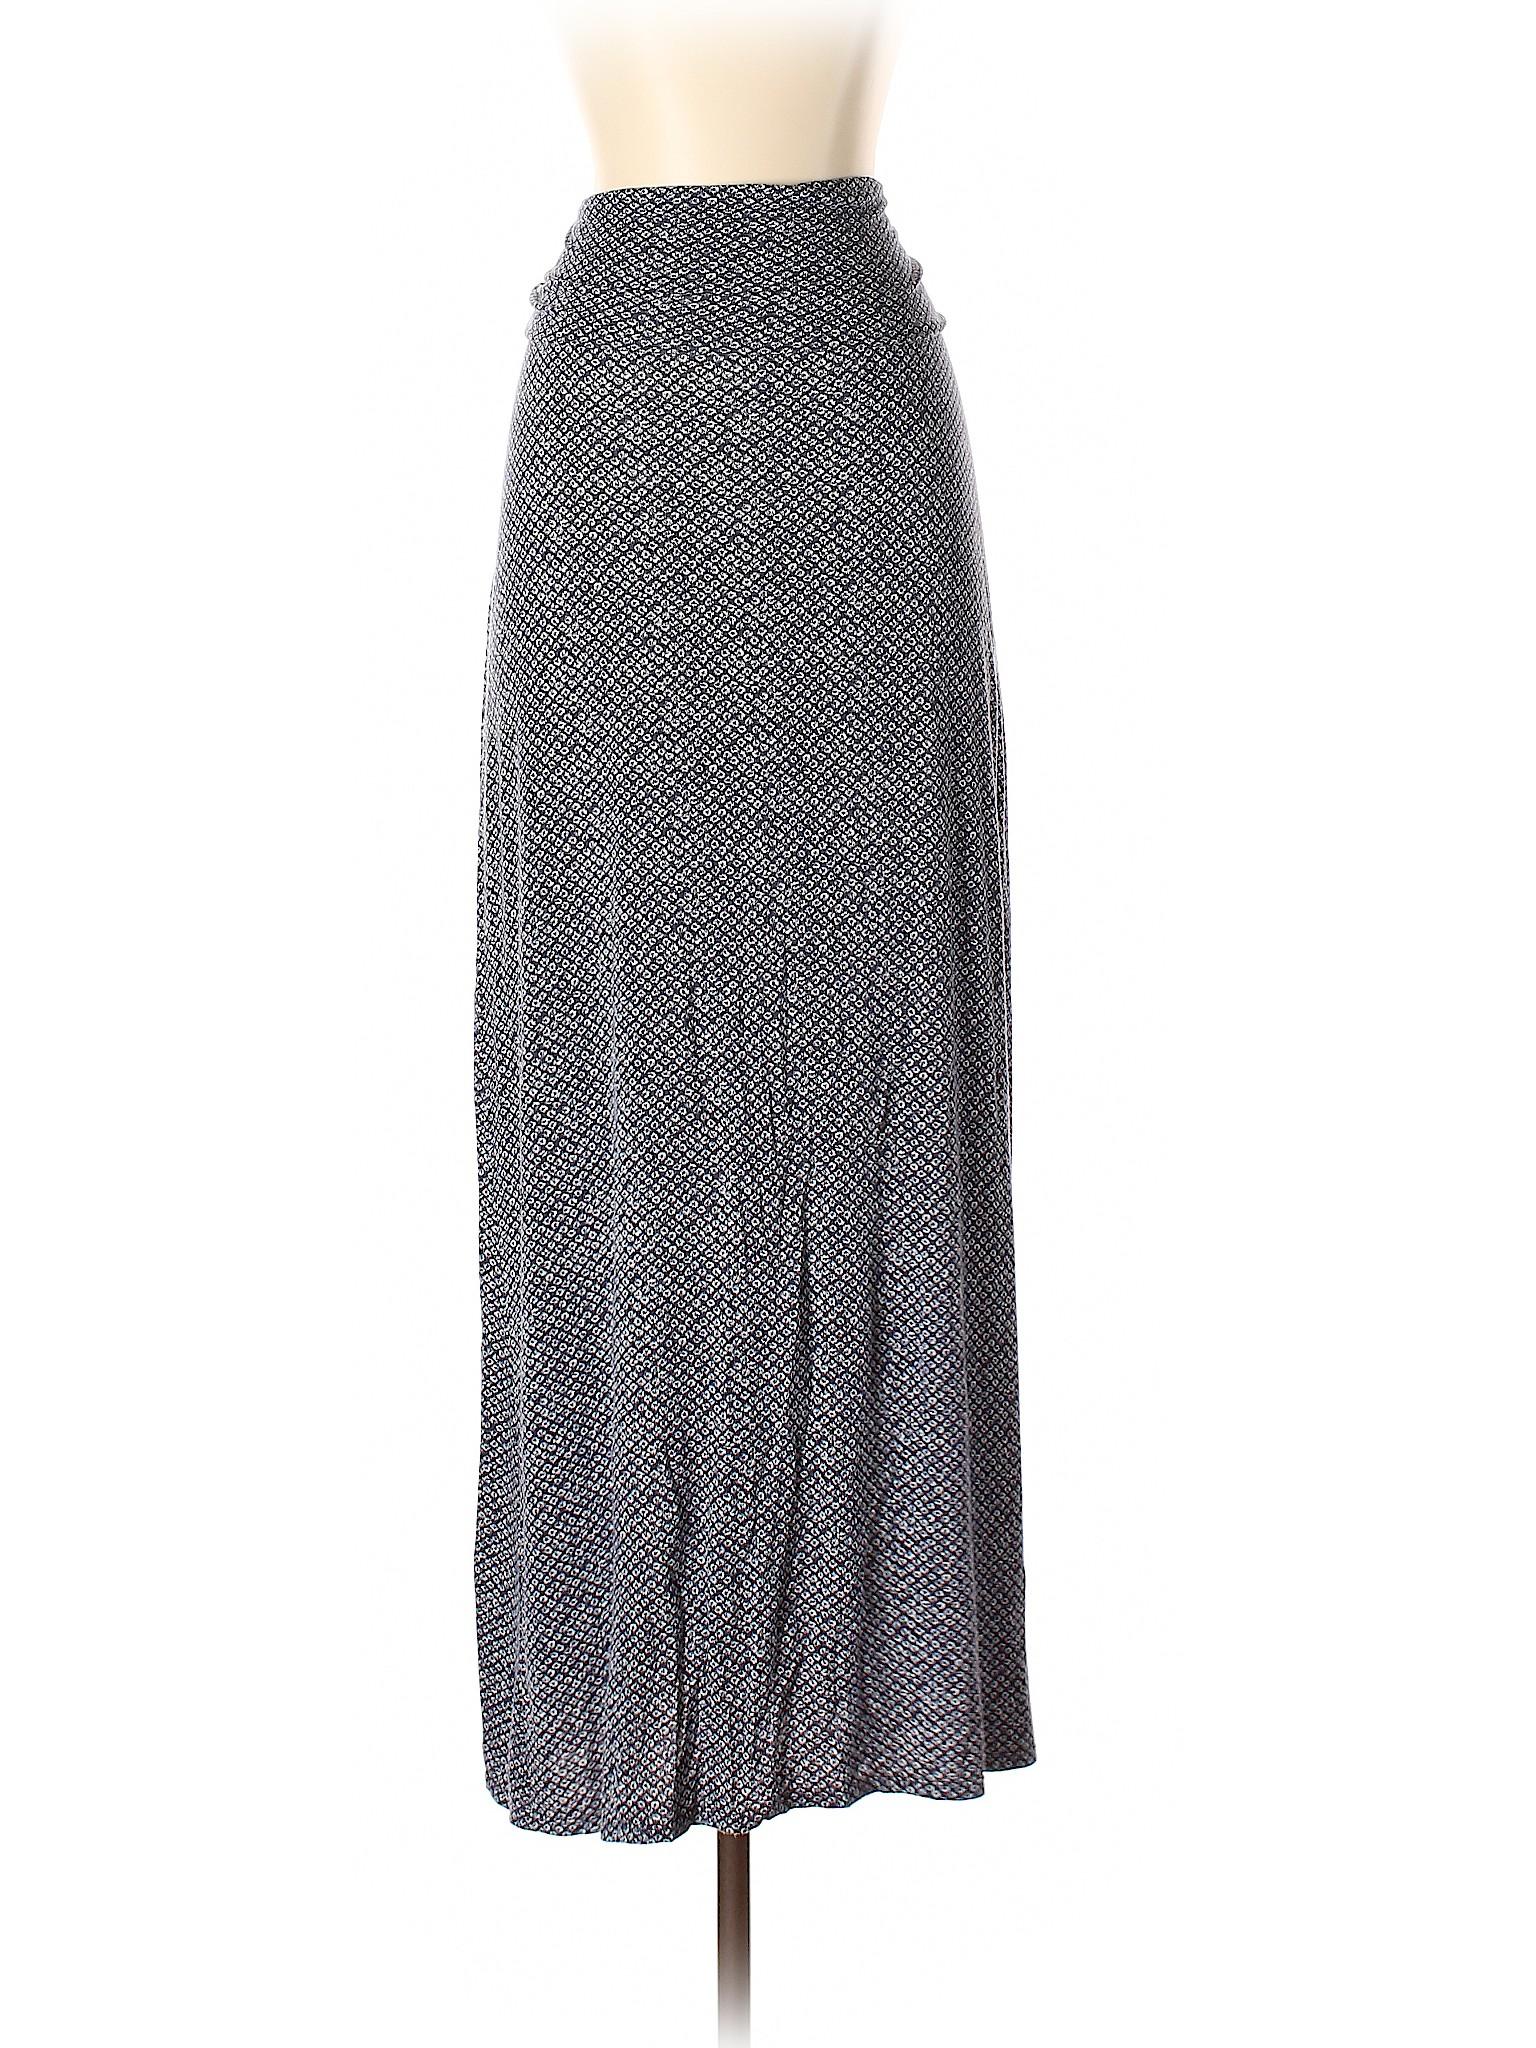 Boutique Skirt Boutique Casual Skirt Boutique Casual Casual Skirt Boutique wSIq8z